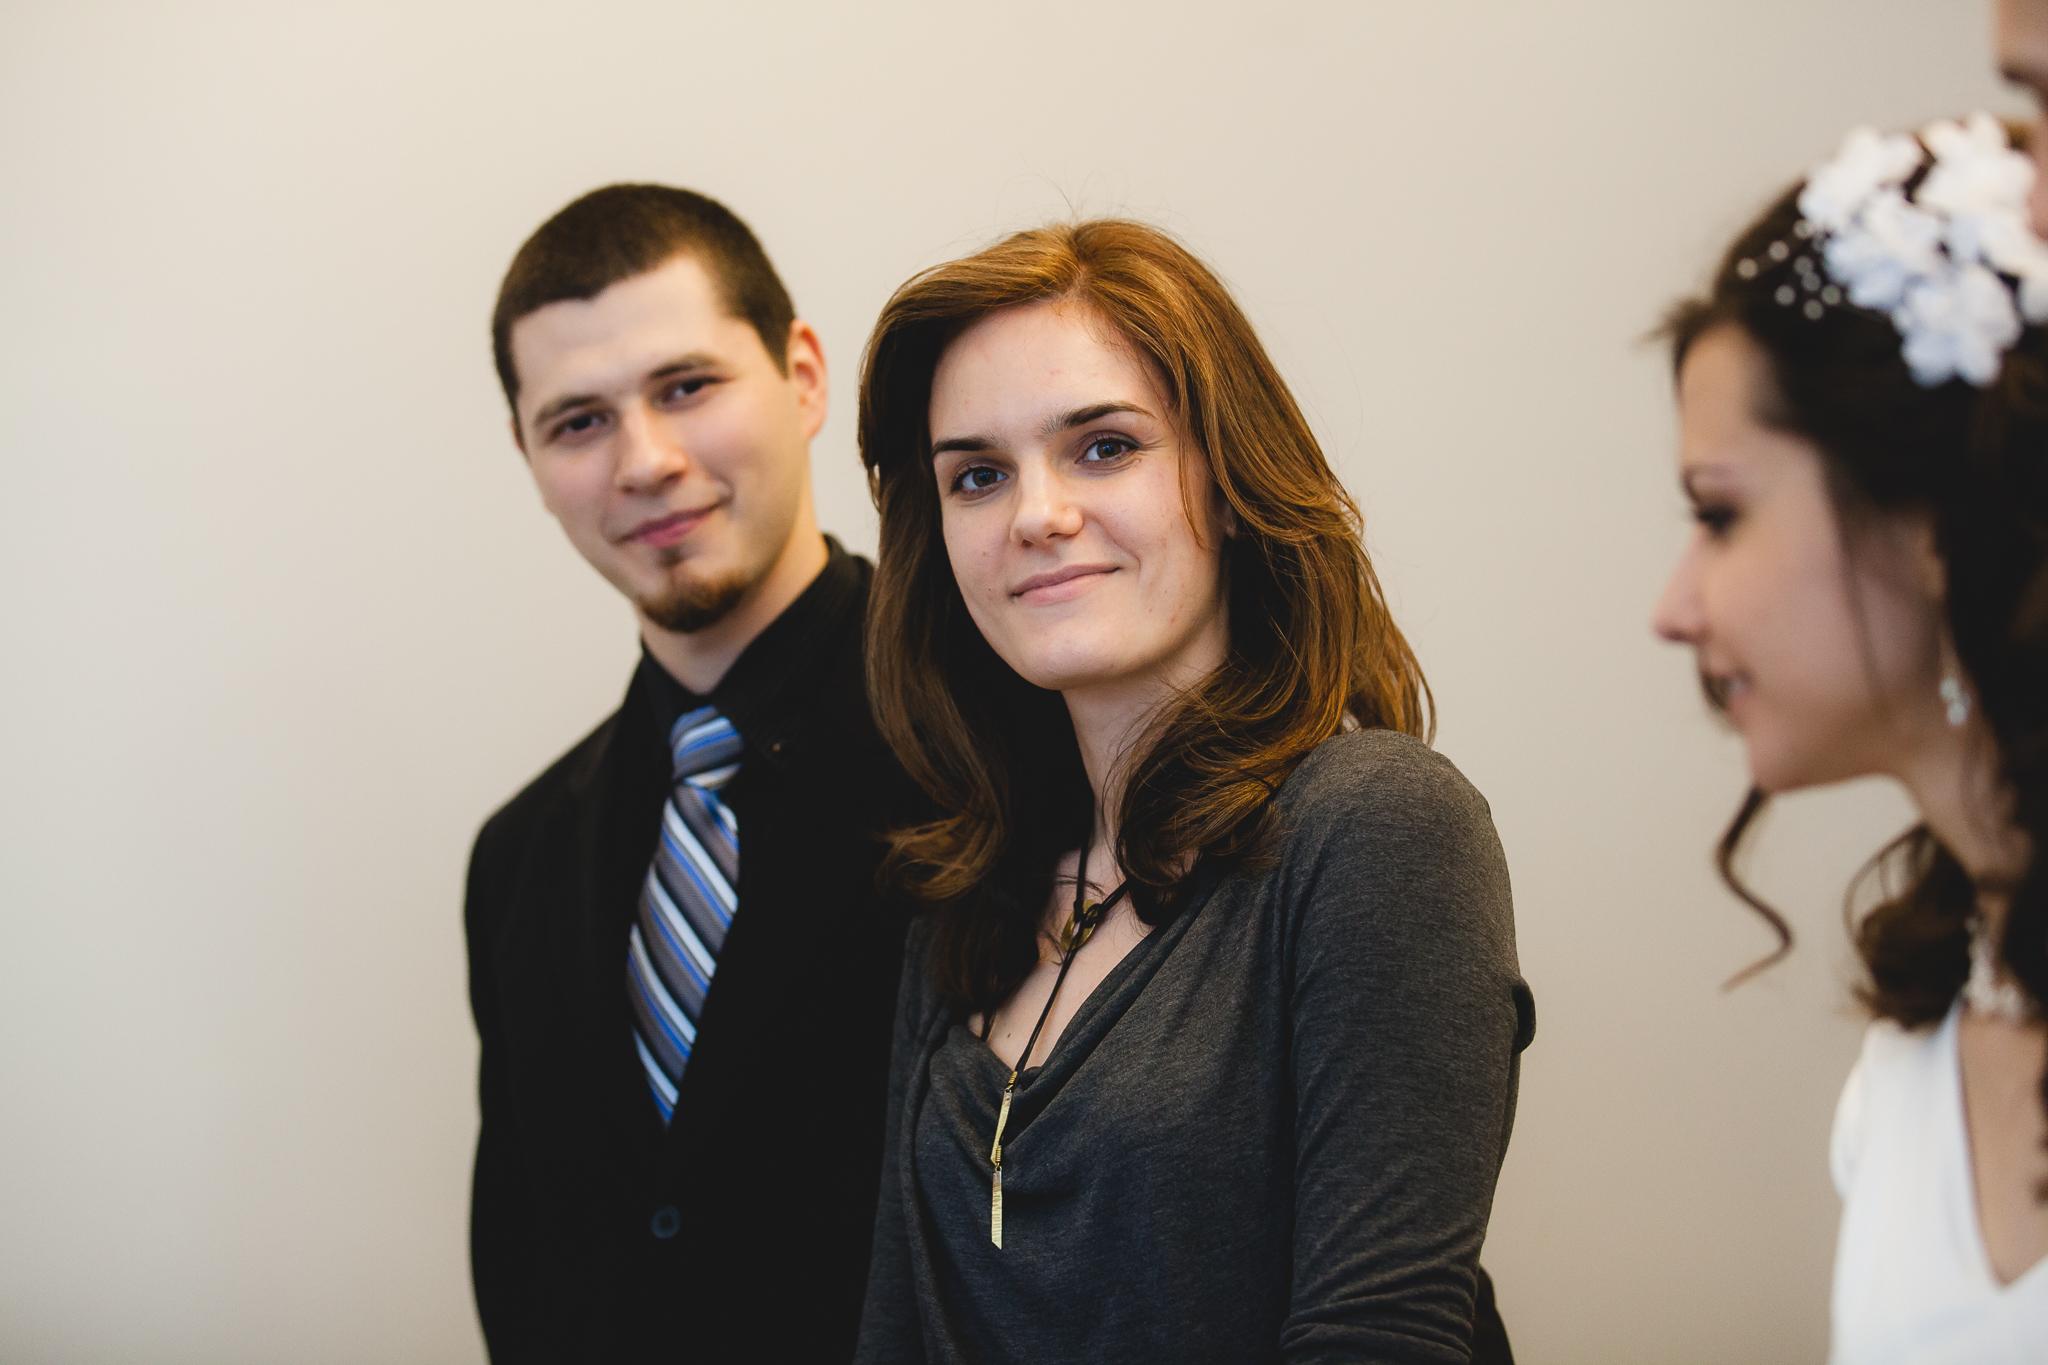 Toronto Wedding Photography - Zoya & Alexei -20.jpg